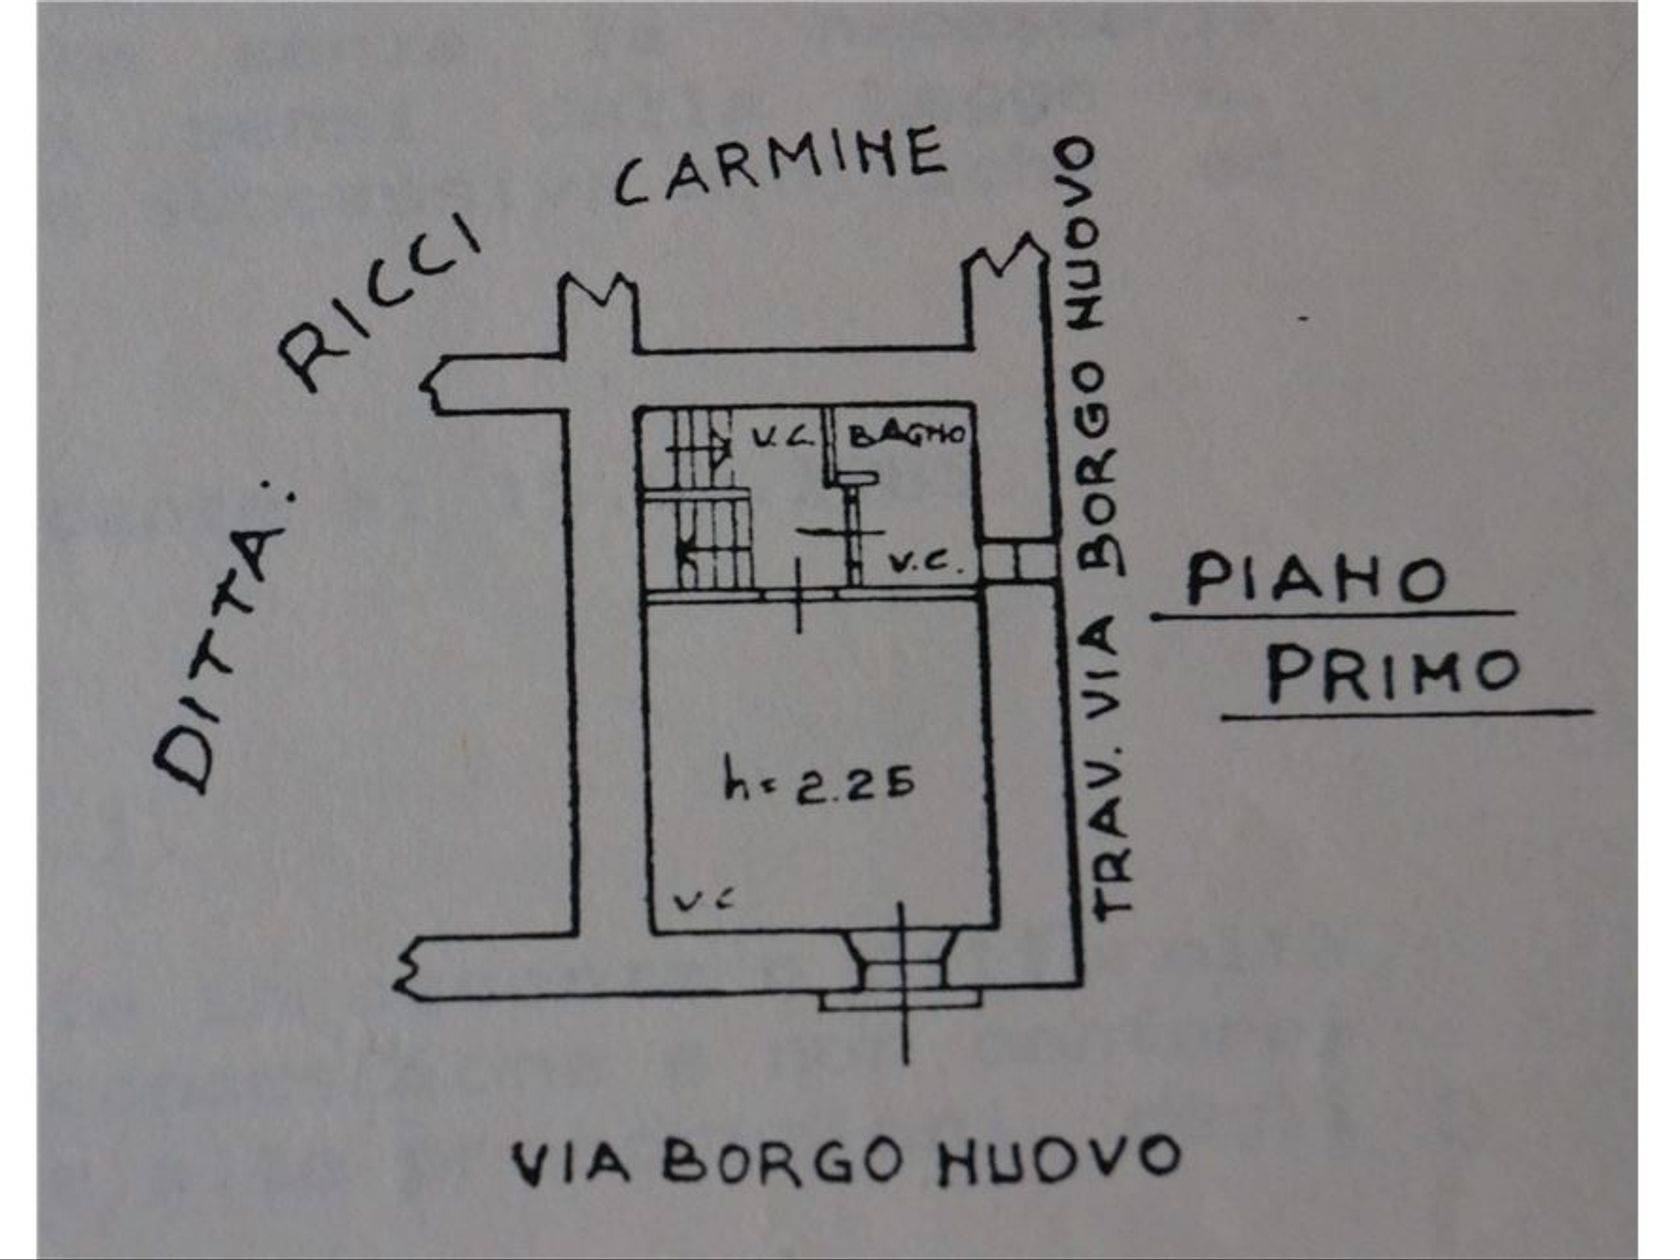 Appartamento Civitella Alfedena, AQ Vendita - Foto 30